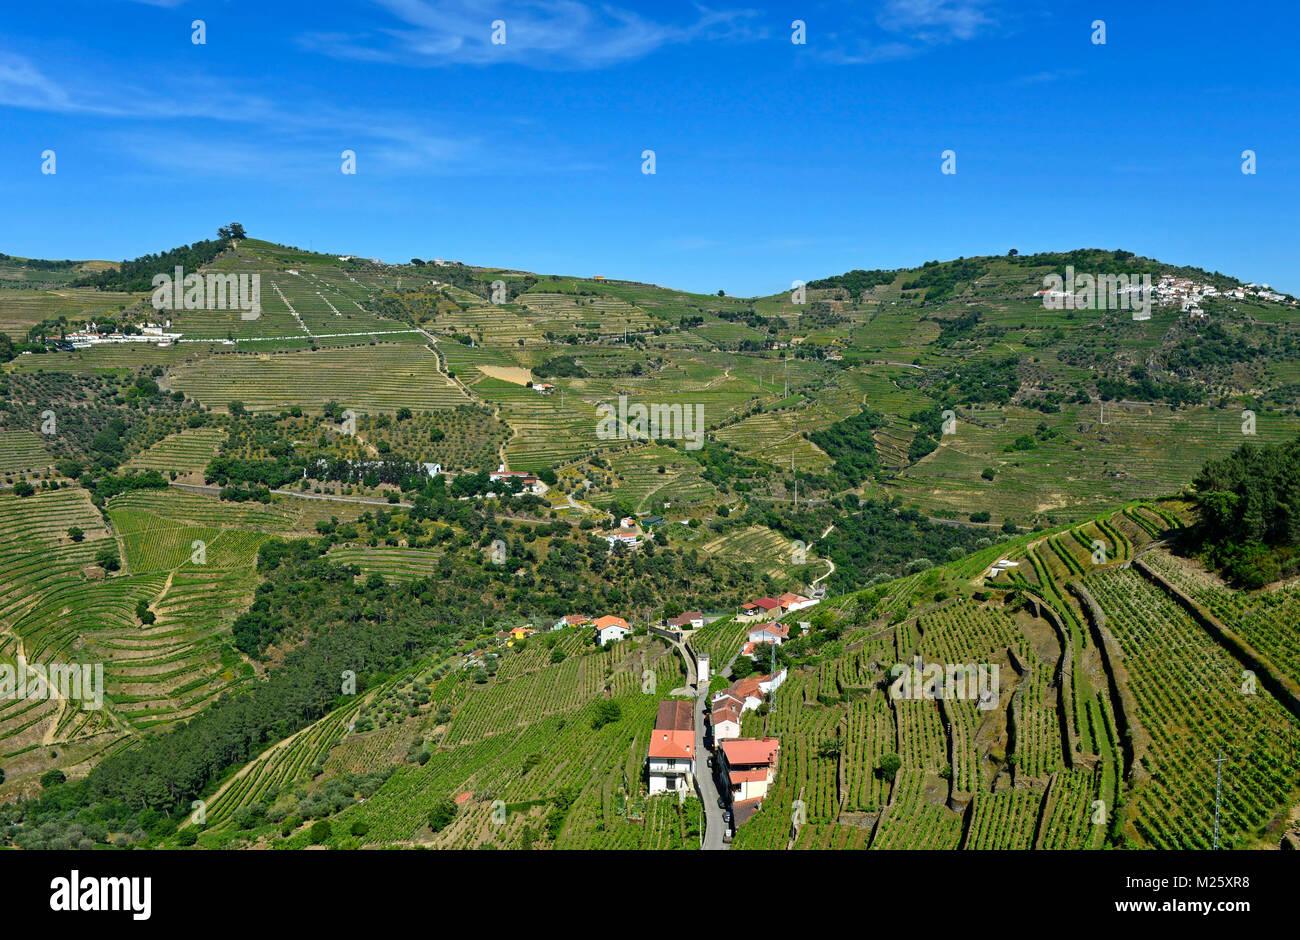 Terraced vineyards in the Rio Pinhao Valley, Sao Cristovao do Douro, Portugal - Stock Image